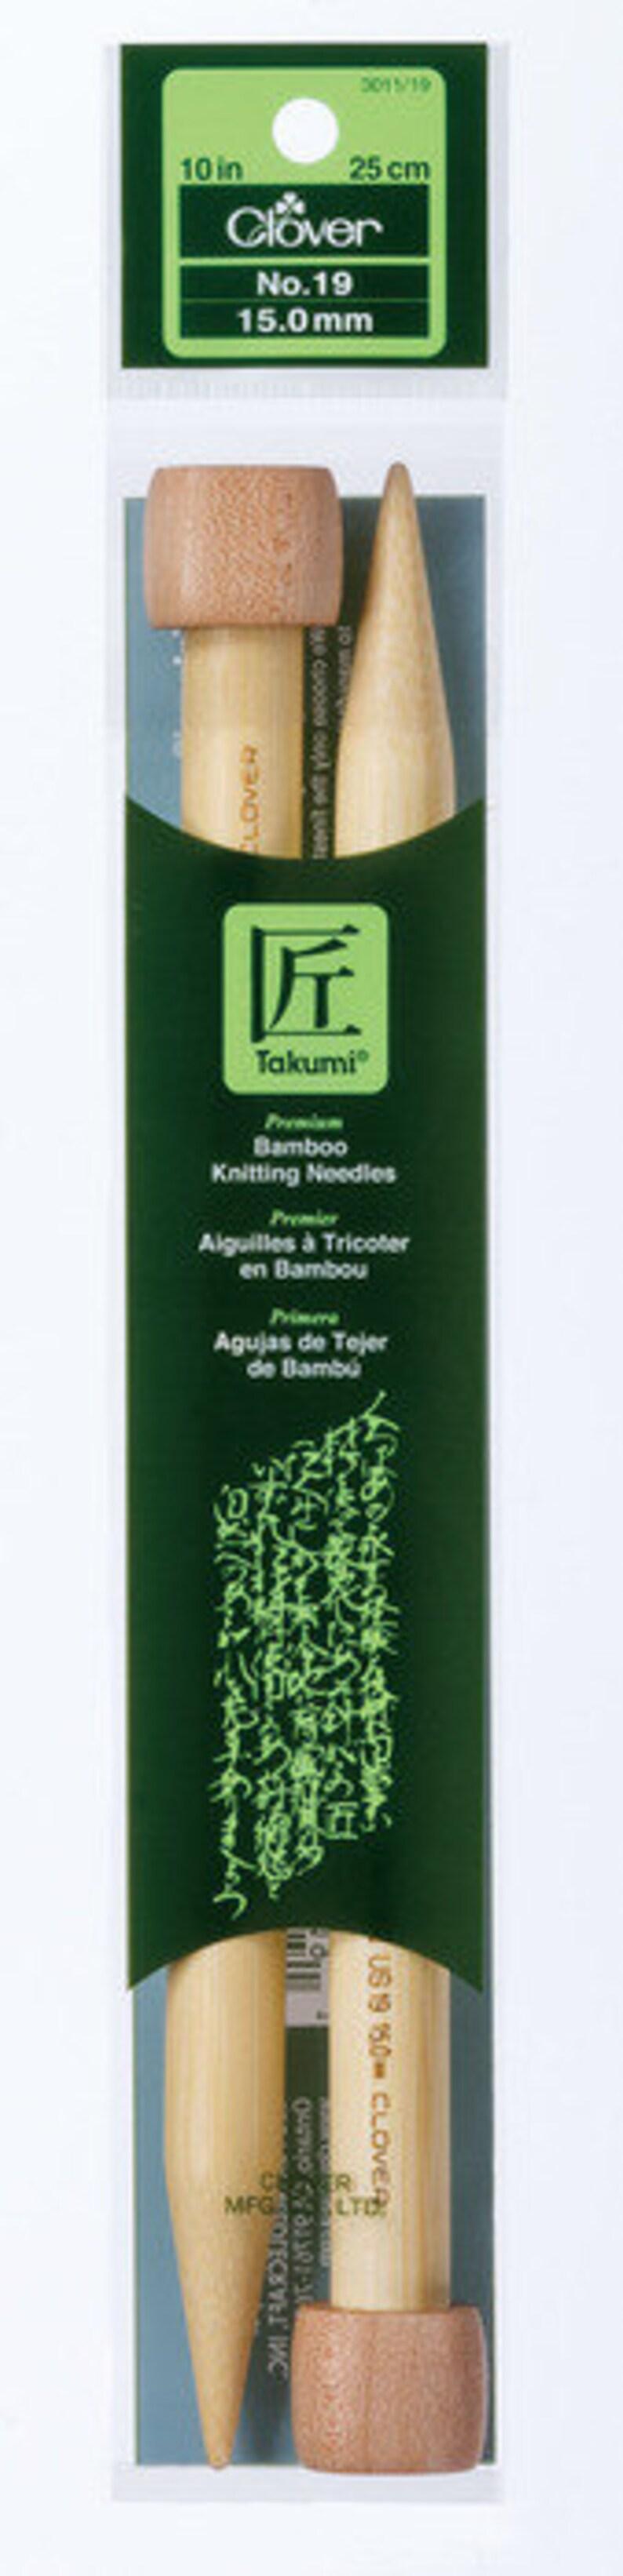 3011-19 Clover 10 Inch Size 19 Takumi Single Point Bamboo Knitting Needles Part No